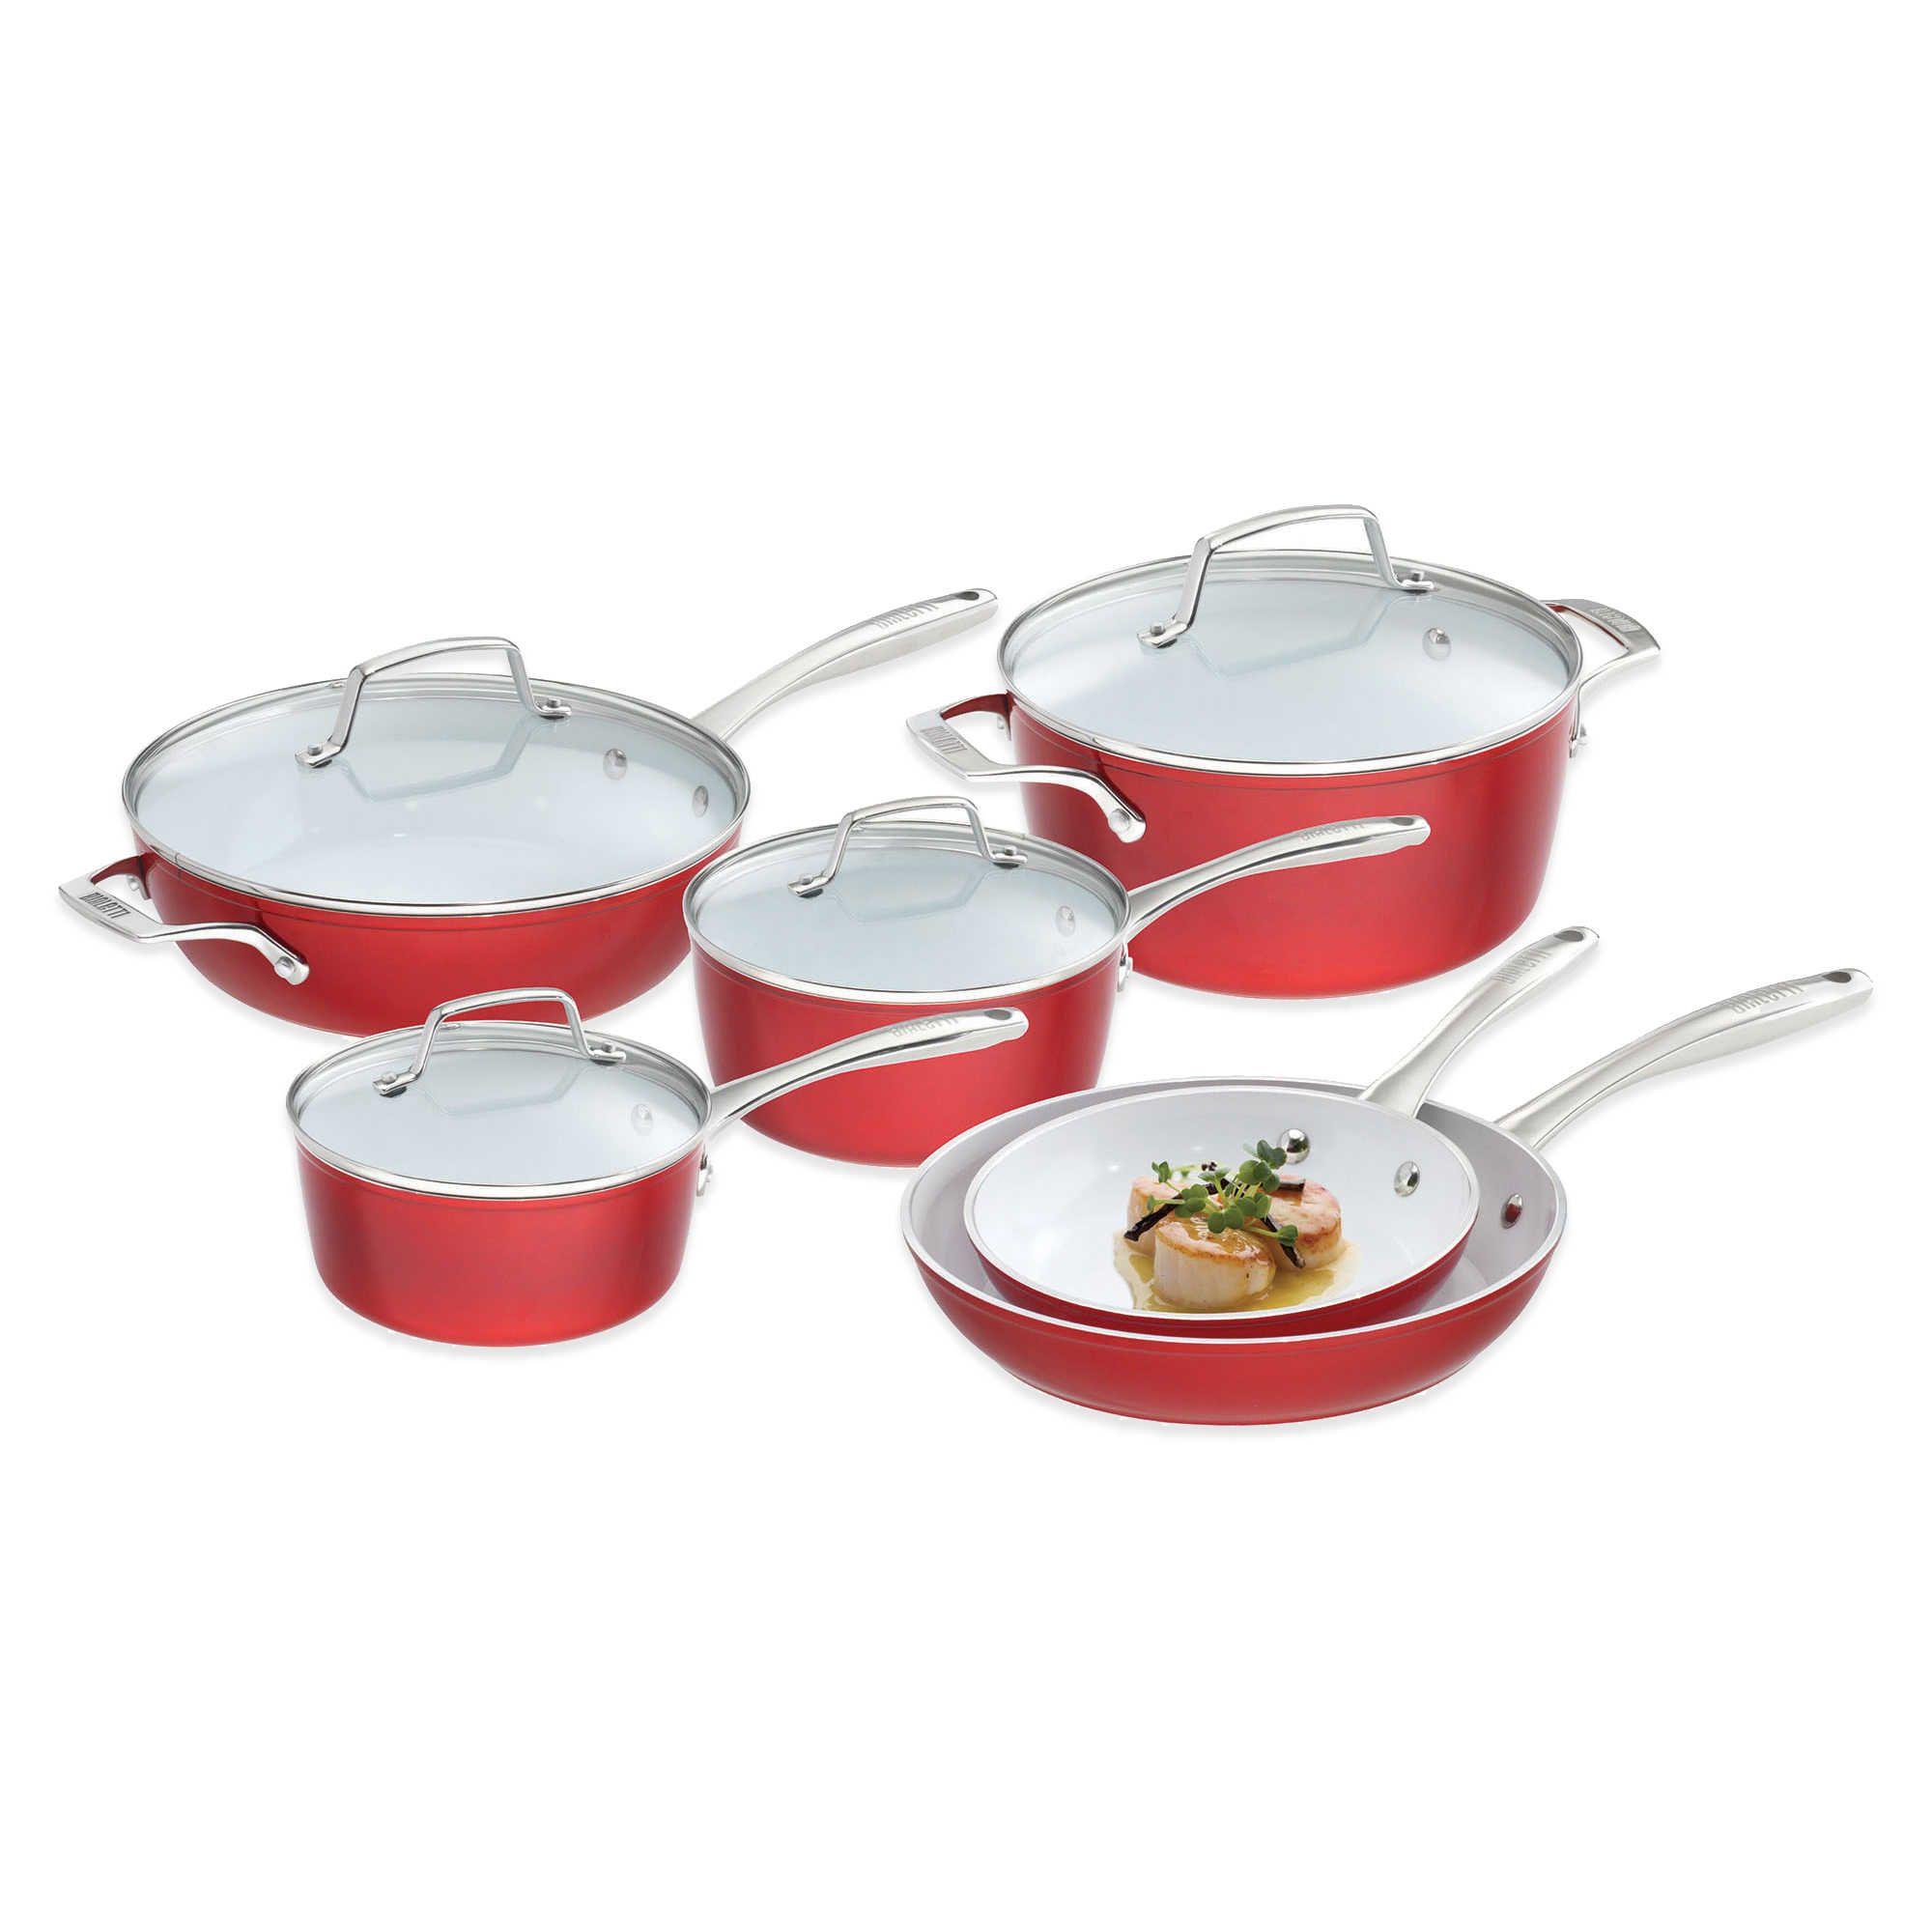 Bialetti® Aeternum Revolution 10Piece Cookware Set and